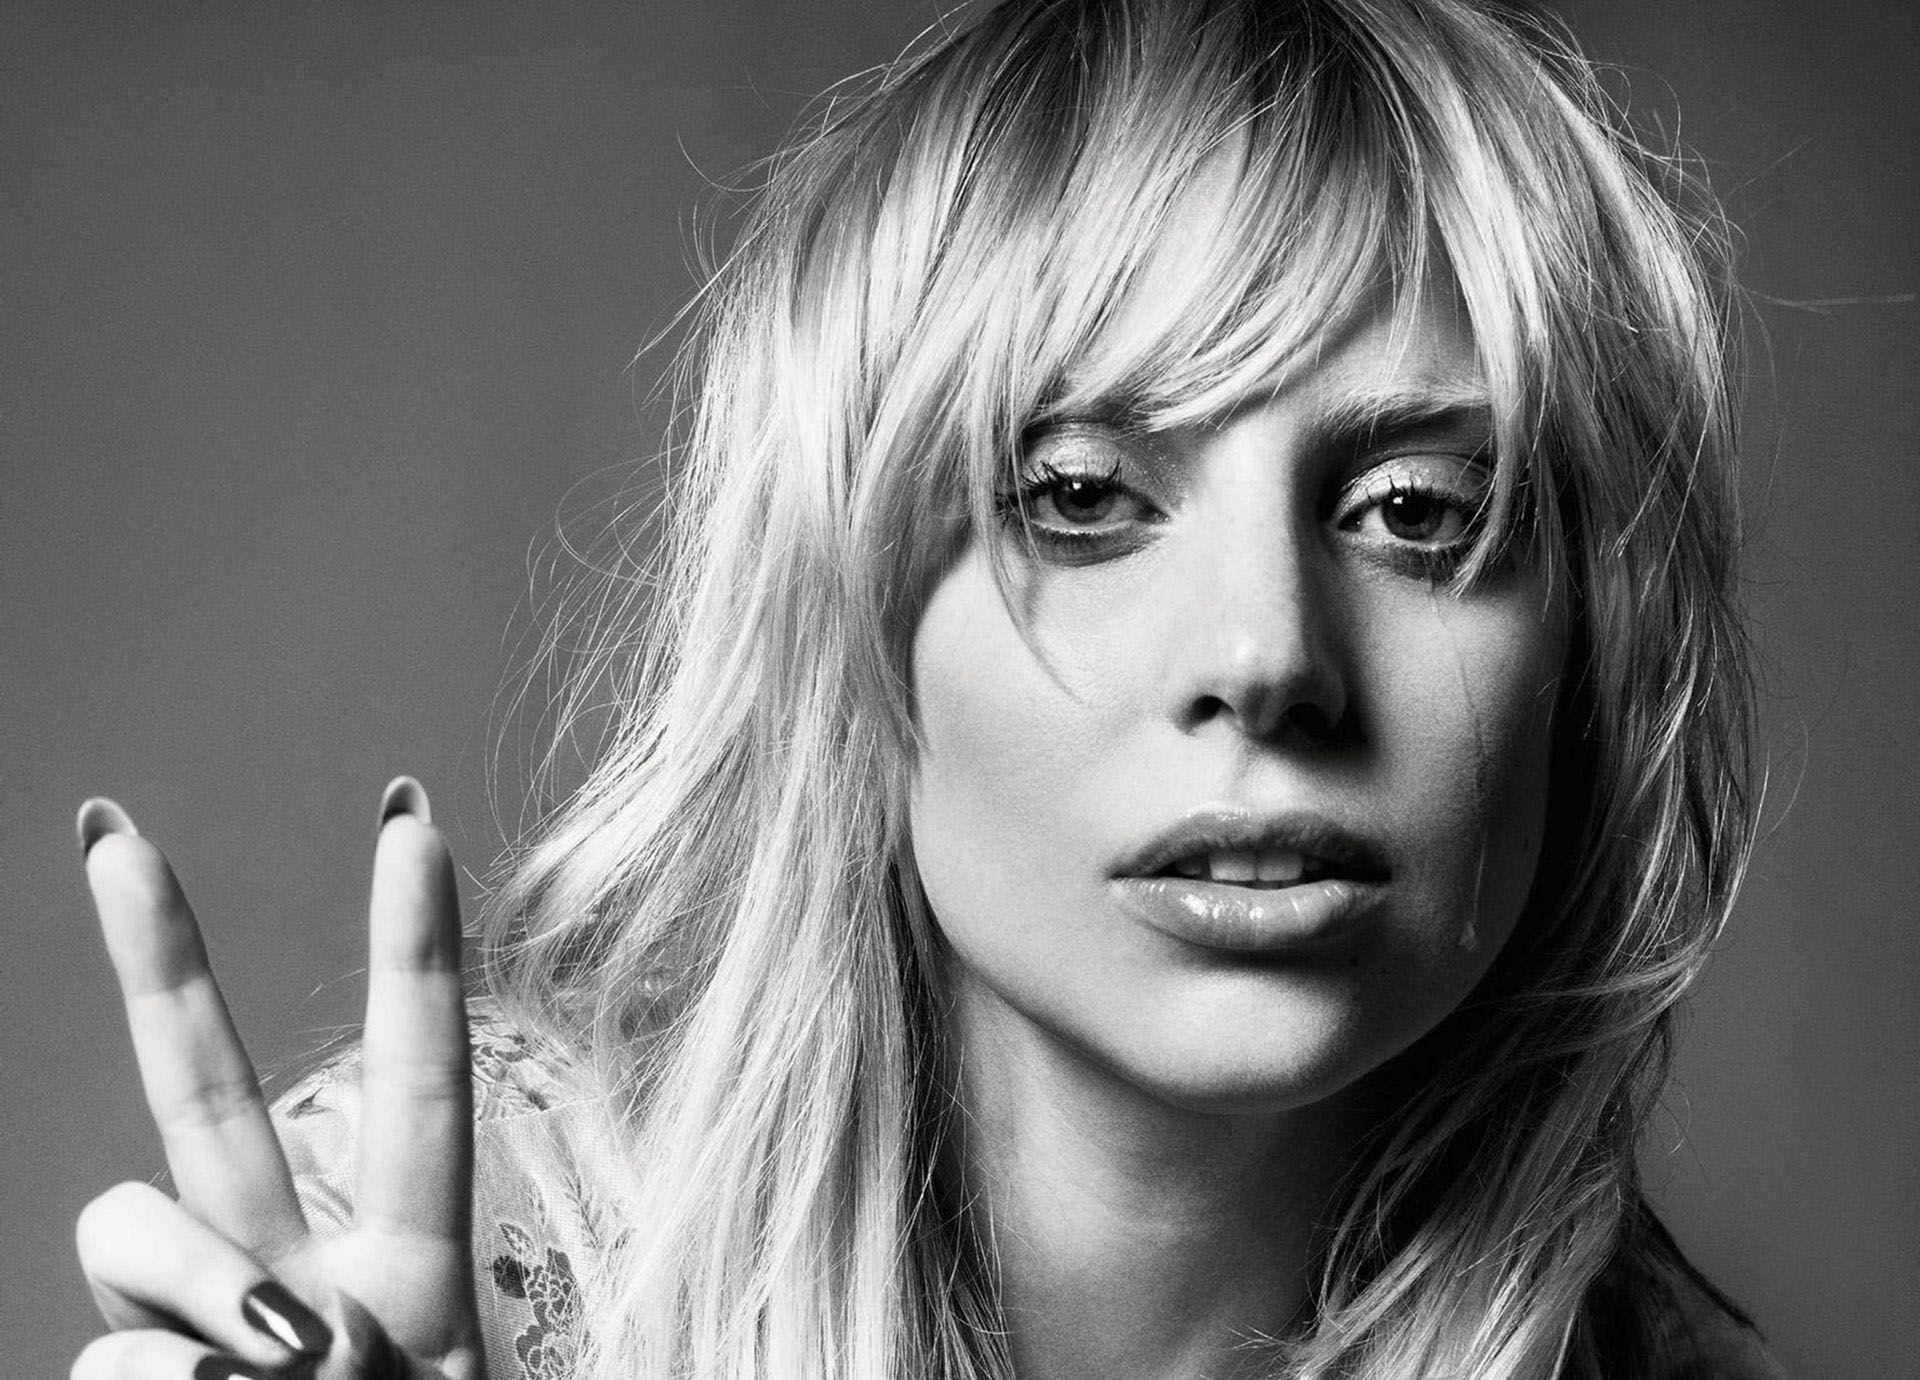 Lady Gaga Wallpapers 2016 - Wallpaper Cave